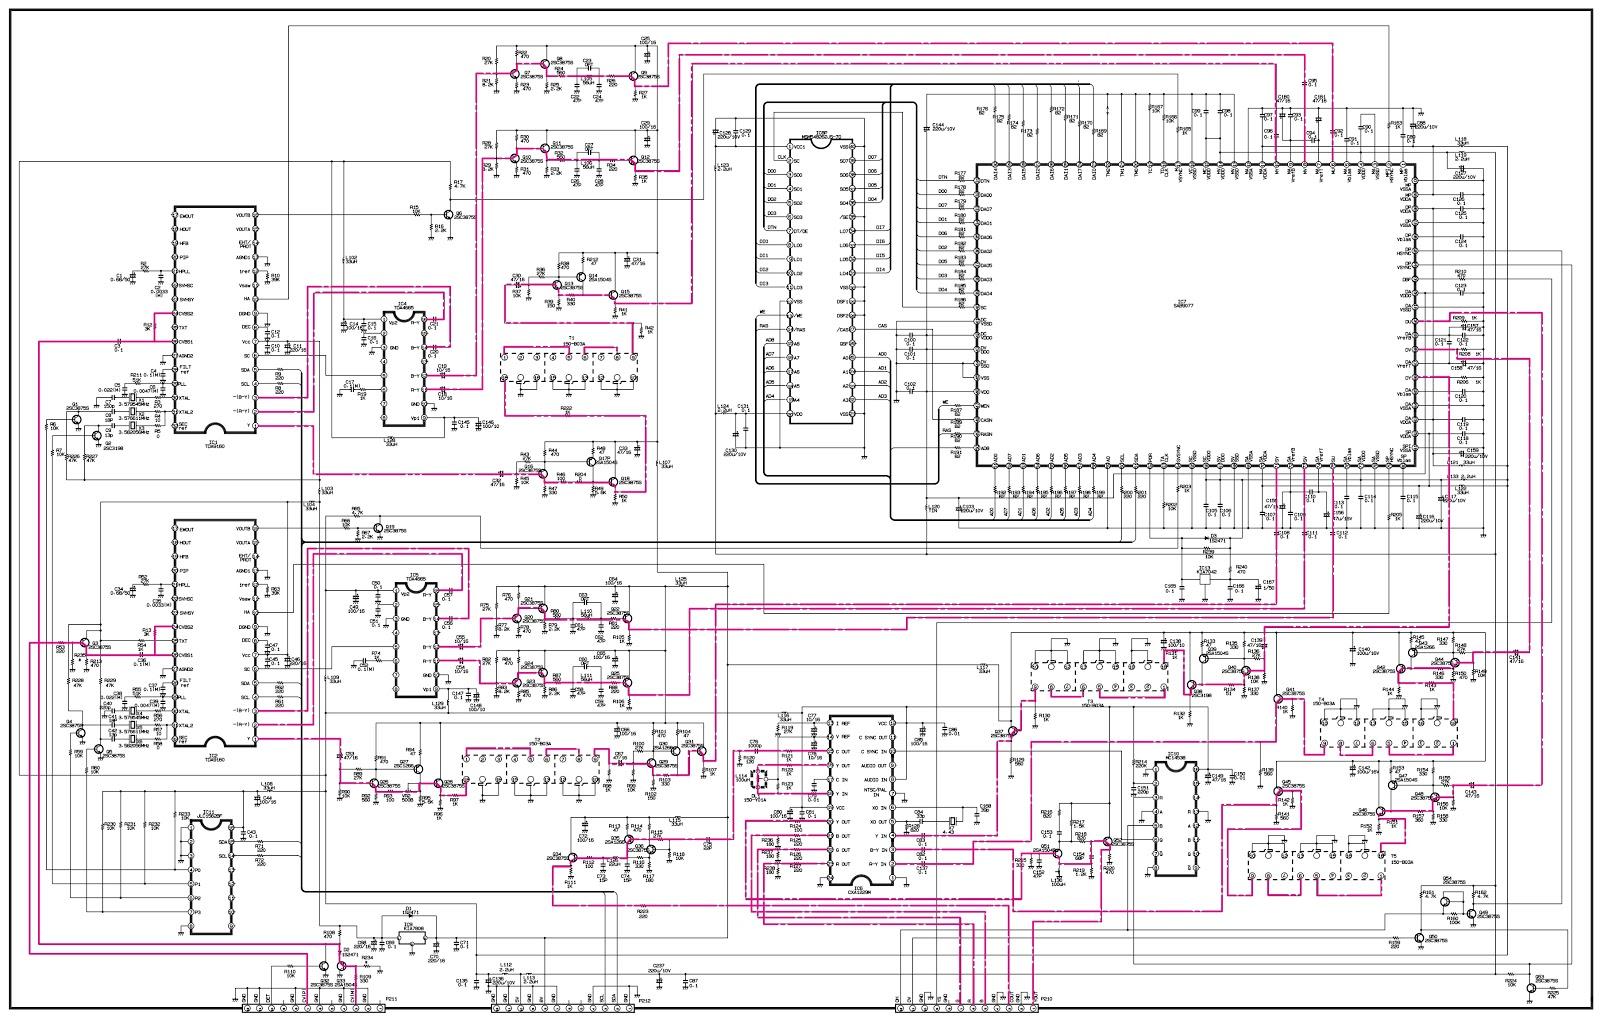 pip and vcr wiring diagram wiring diagram jvc car stereo wiring diagram jvc vcr wiring diagram [ 1600 x 1018 Pixel ]